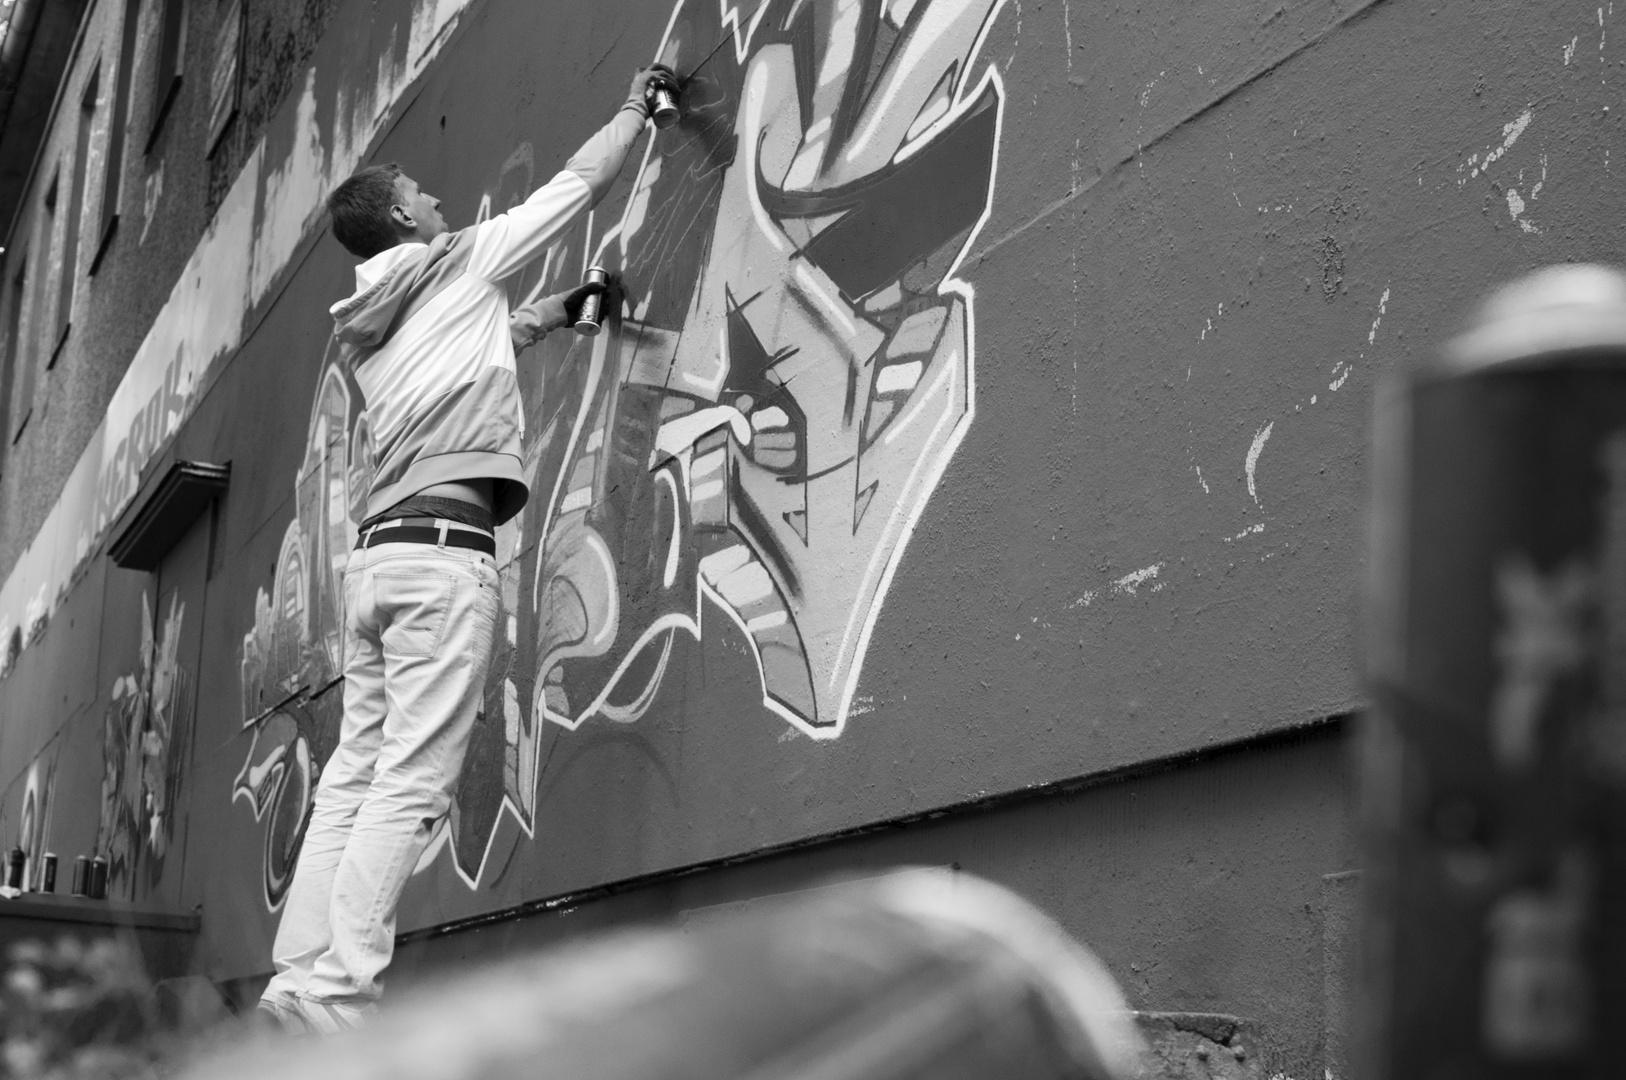 Graffiti in Aktion